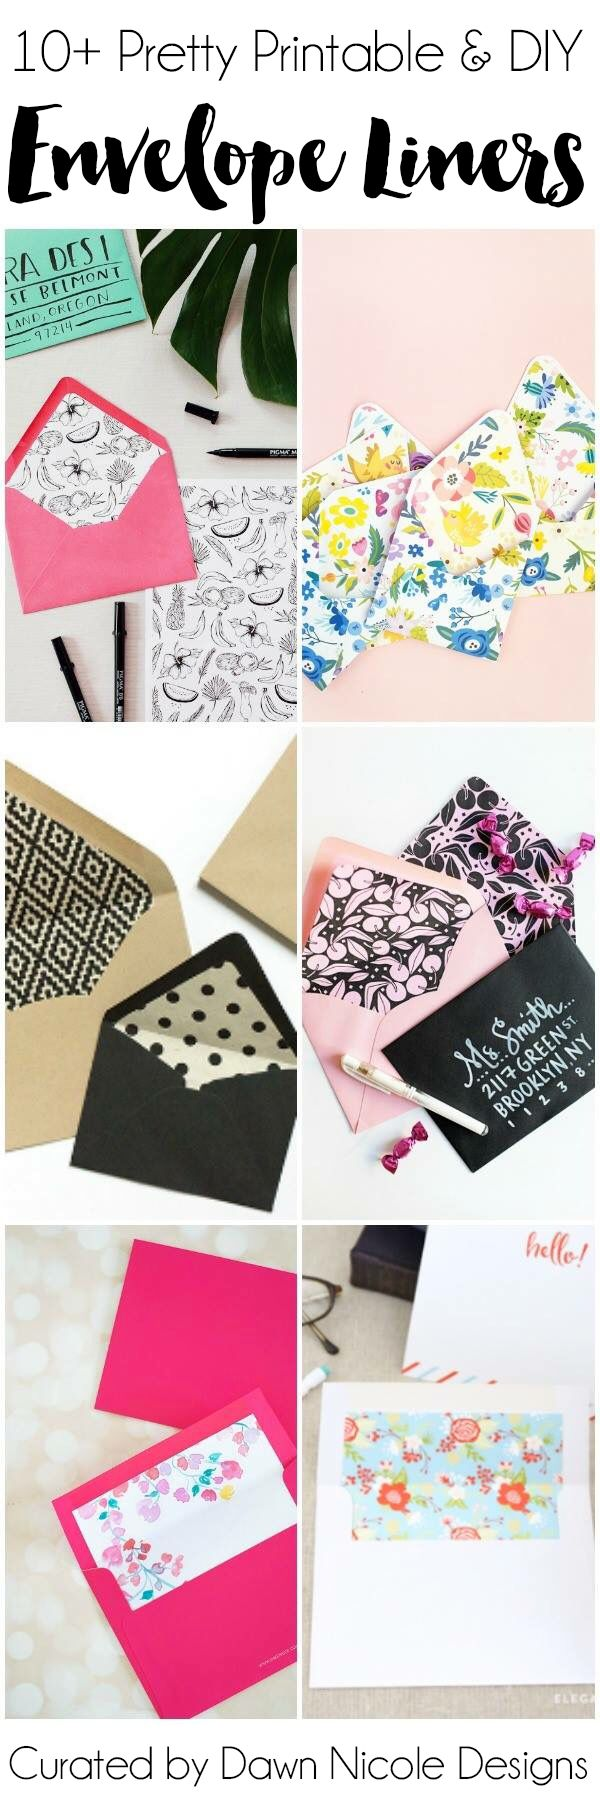 10+ Pretty Printable & DIY Envelope Liners